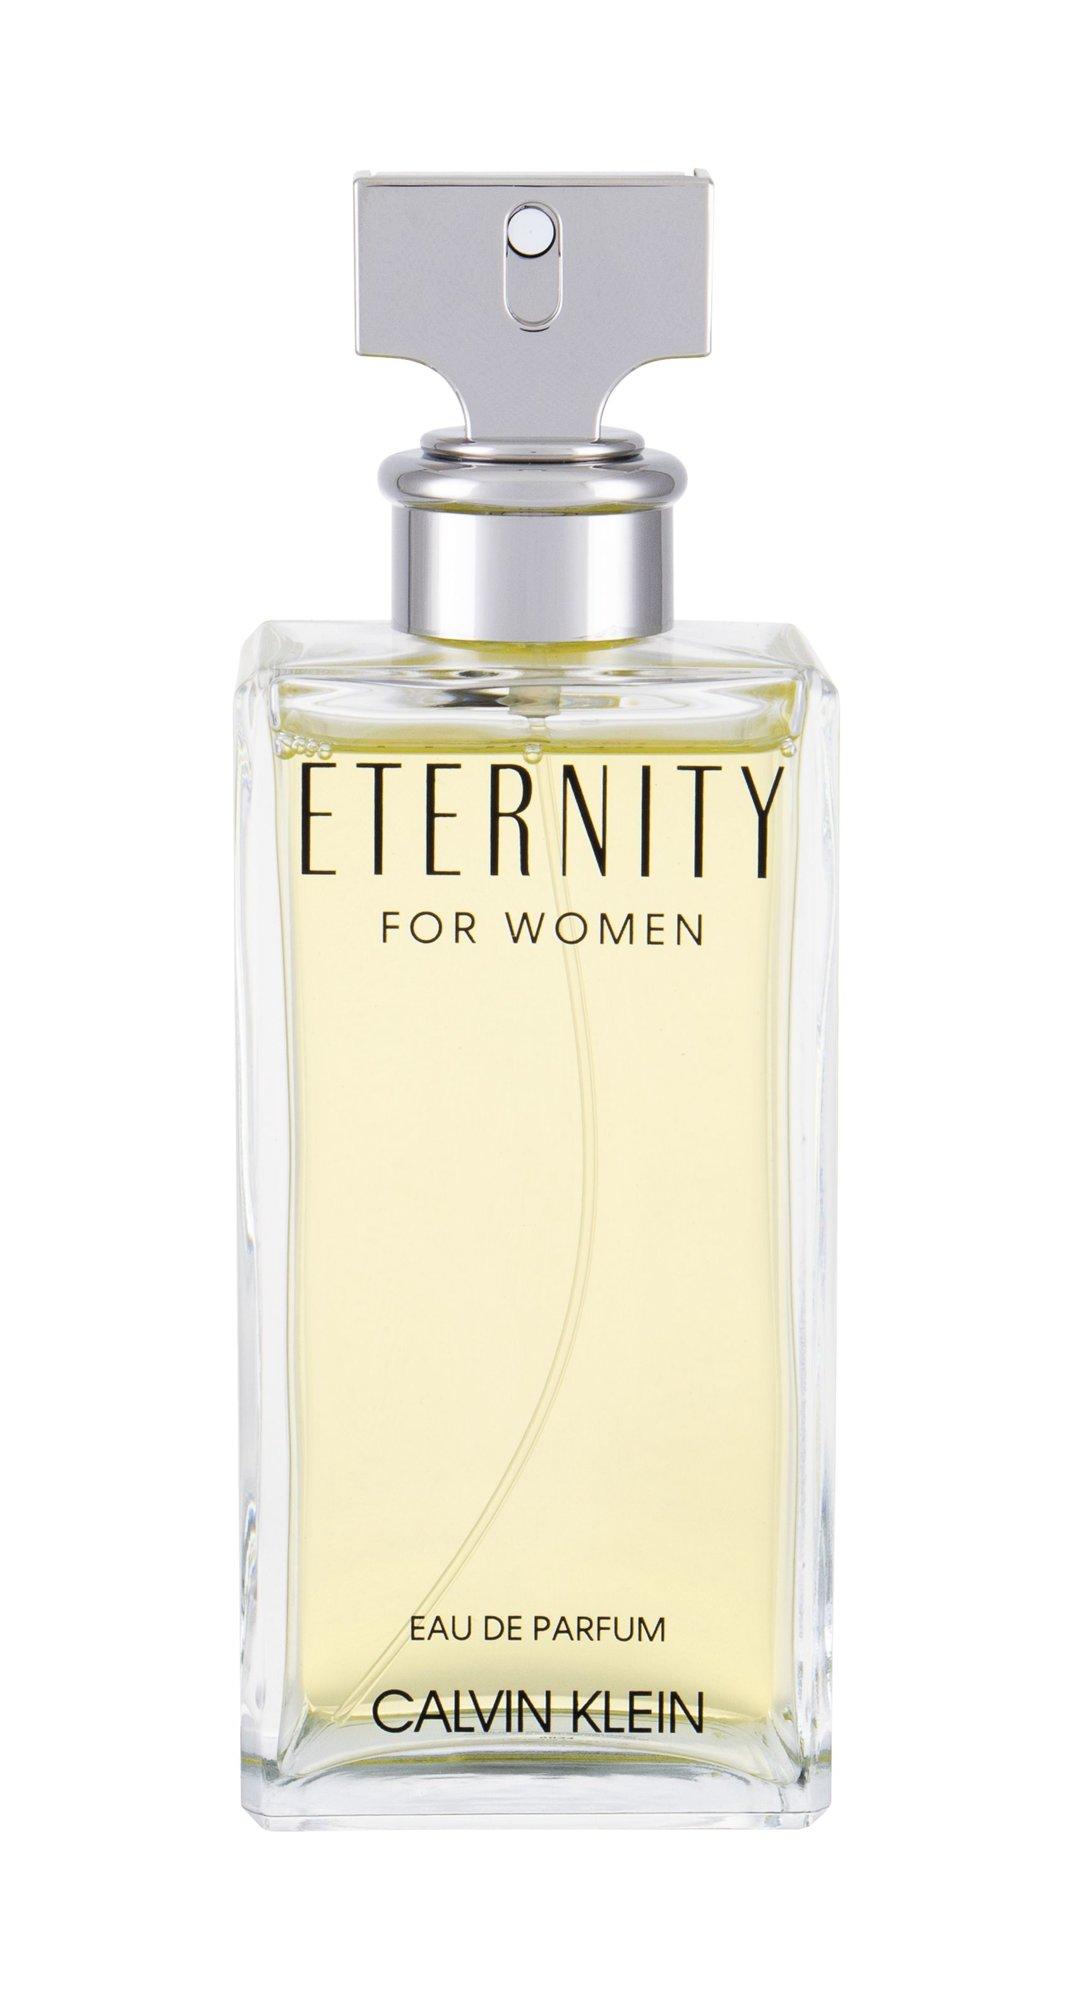 Calvin Klein Eternity Eau de Parfum 200ml